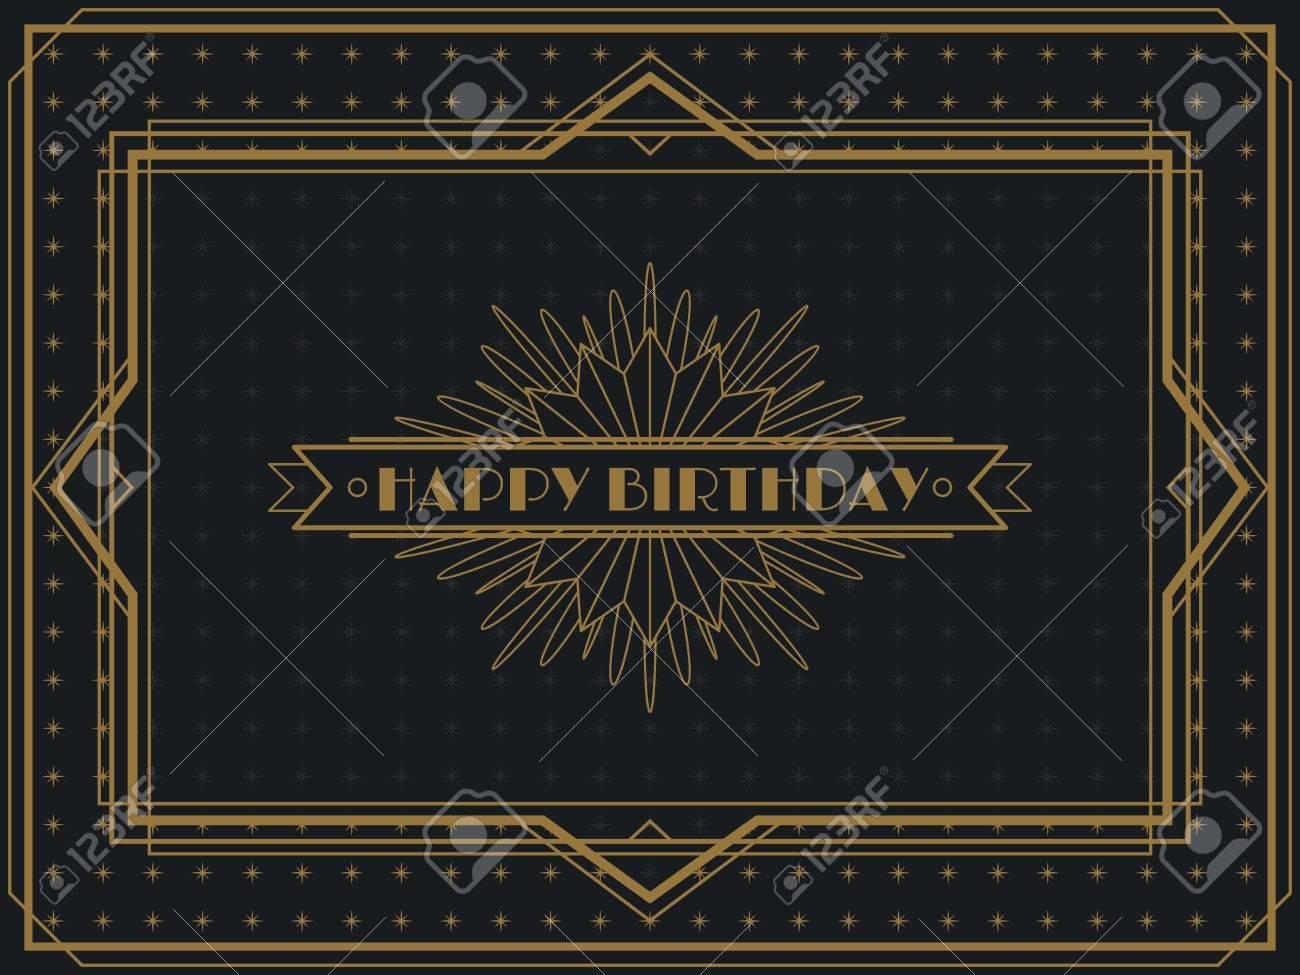 Vintage Art Deco Happy Birthday card frame design template - 50146371